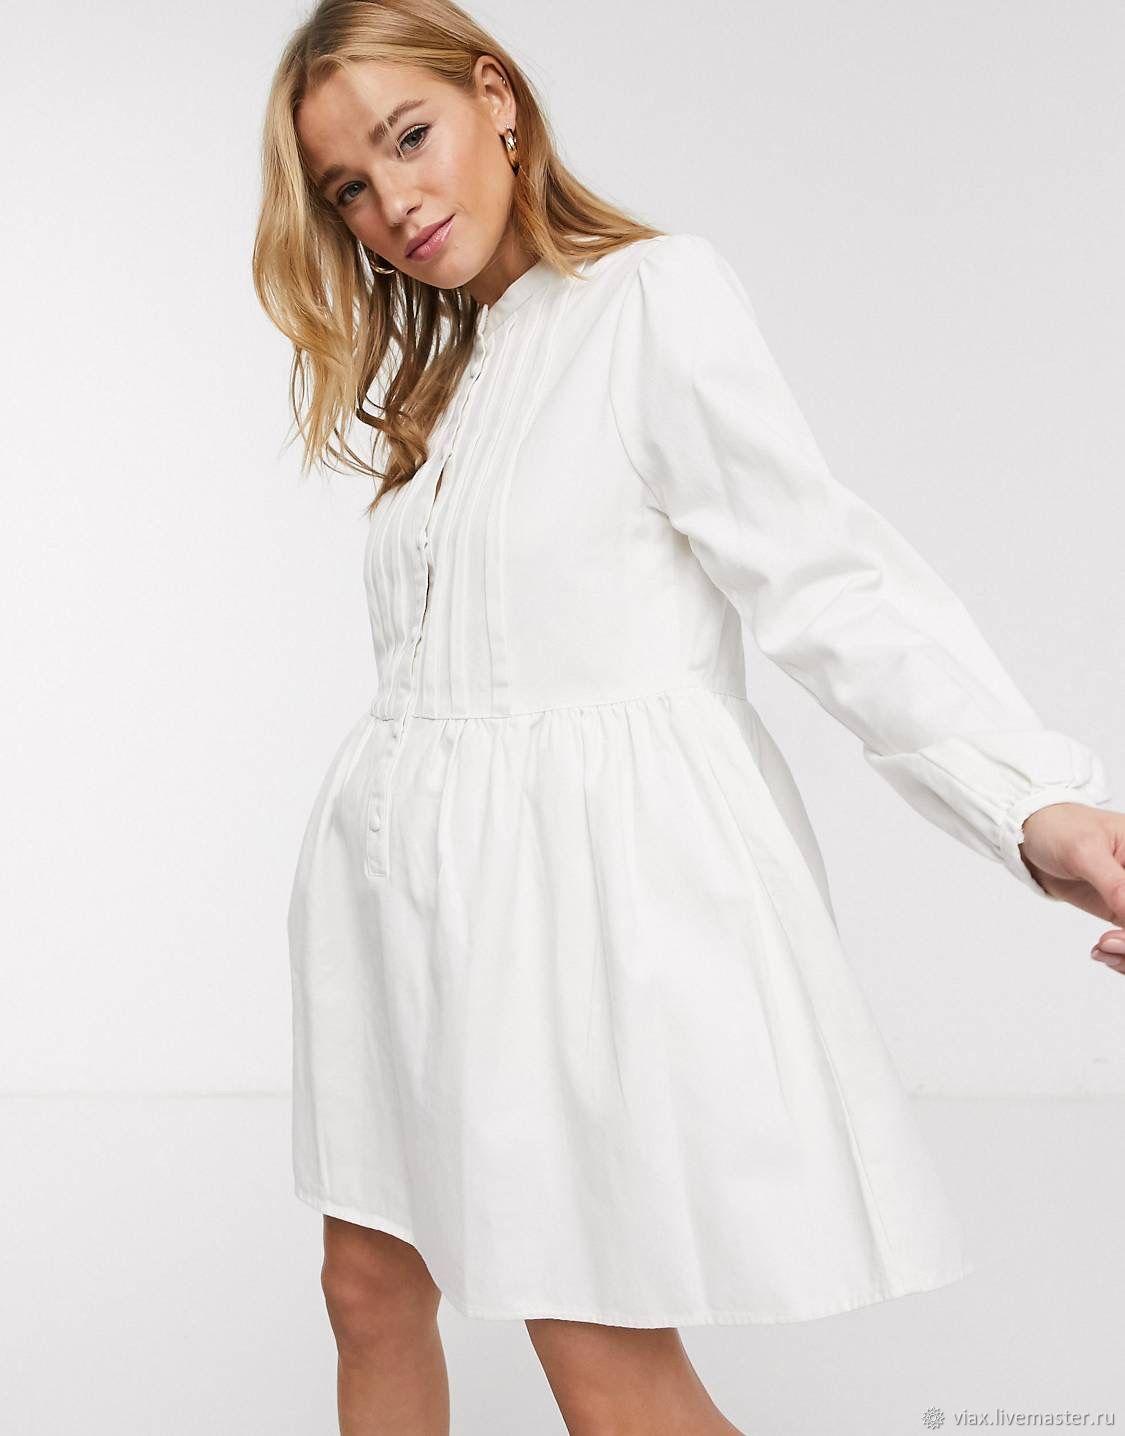 a dress of white denim 'Blanco», Dresses, Rostov-on-Don,  Фото №1